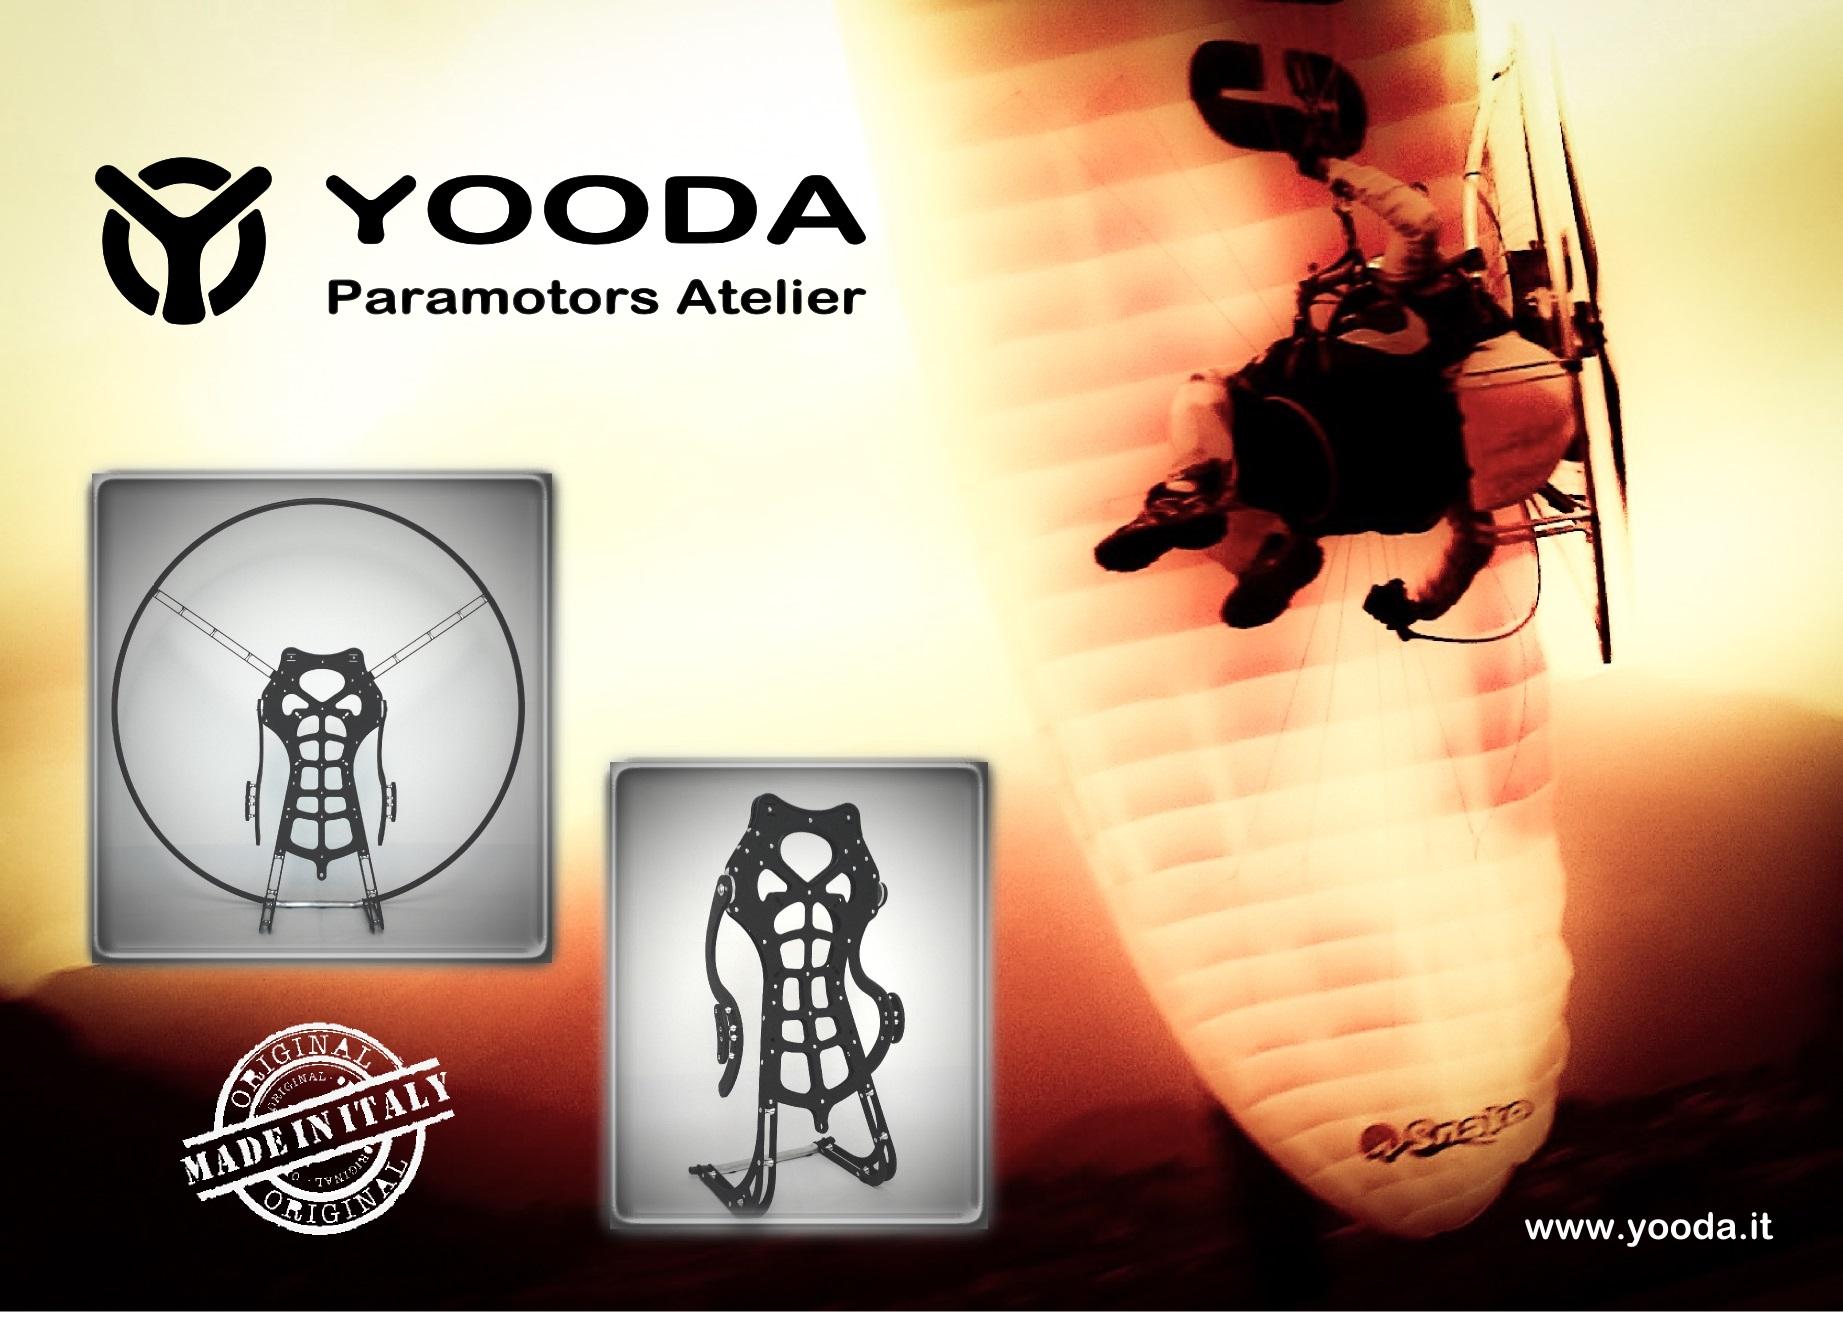 Yooda Paramotors Atelier